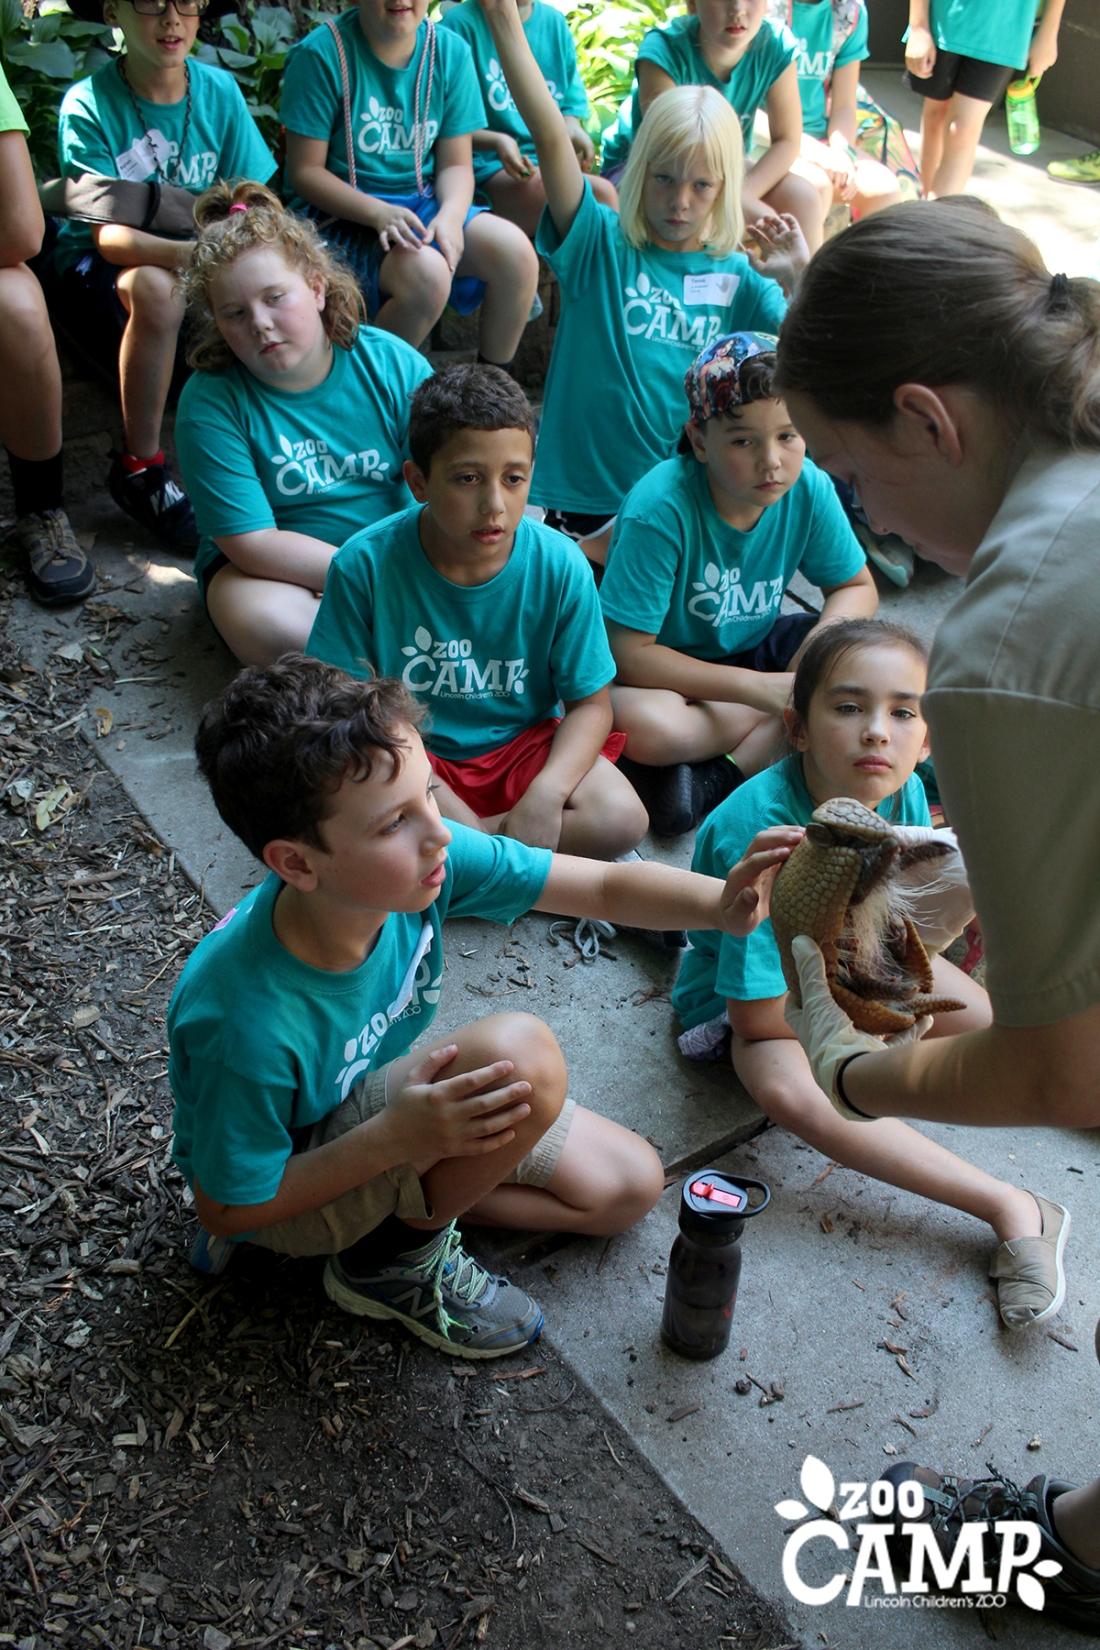 Camp_armadillo_8-10_3392 copy